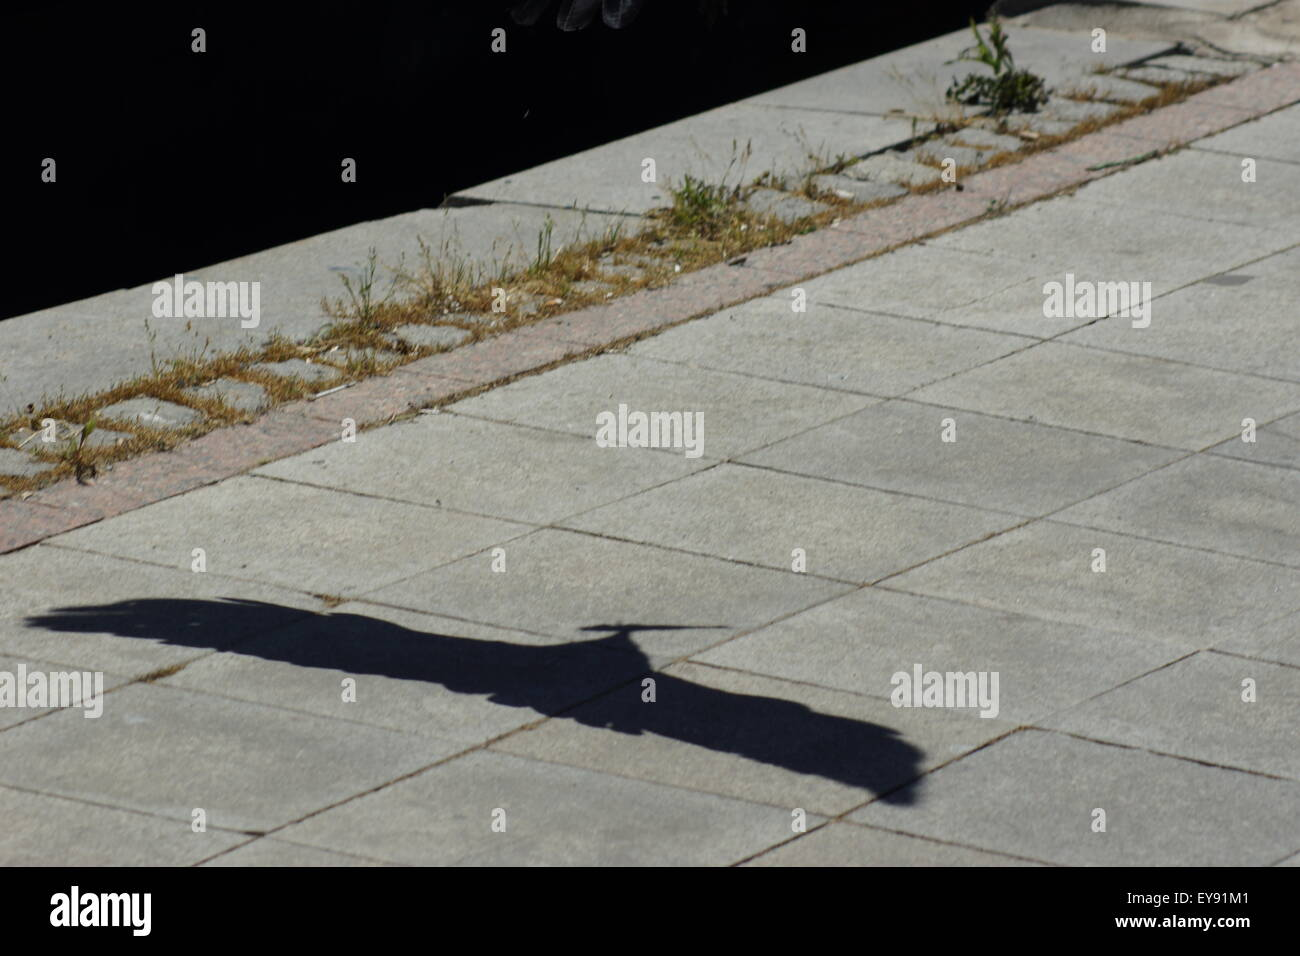 Shadow of falcon with prey Istanbul sidewalk - Stock Image